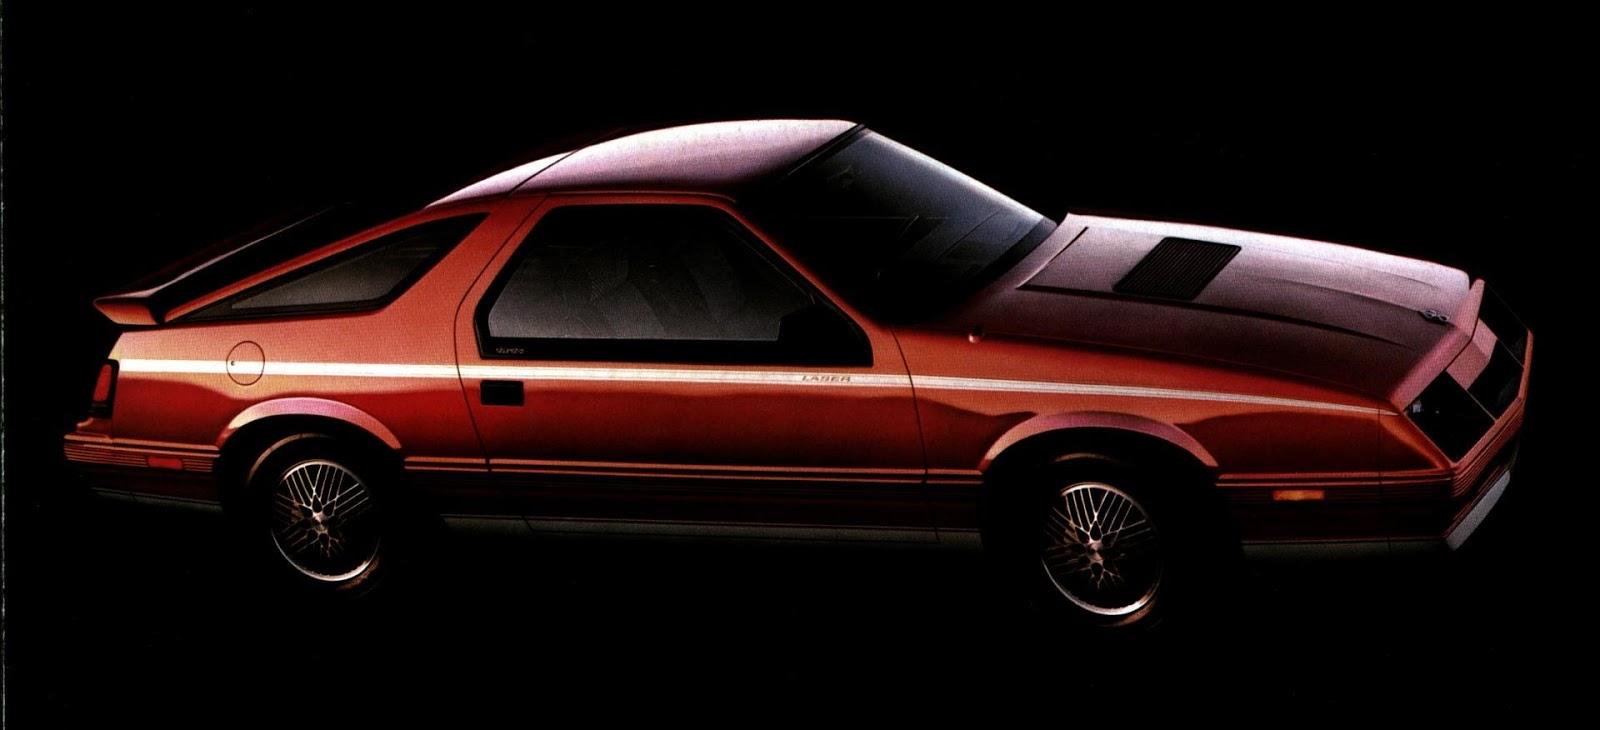 1984 1985 Chrysler Laser Hot Ride Snaxtime